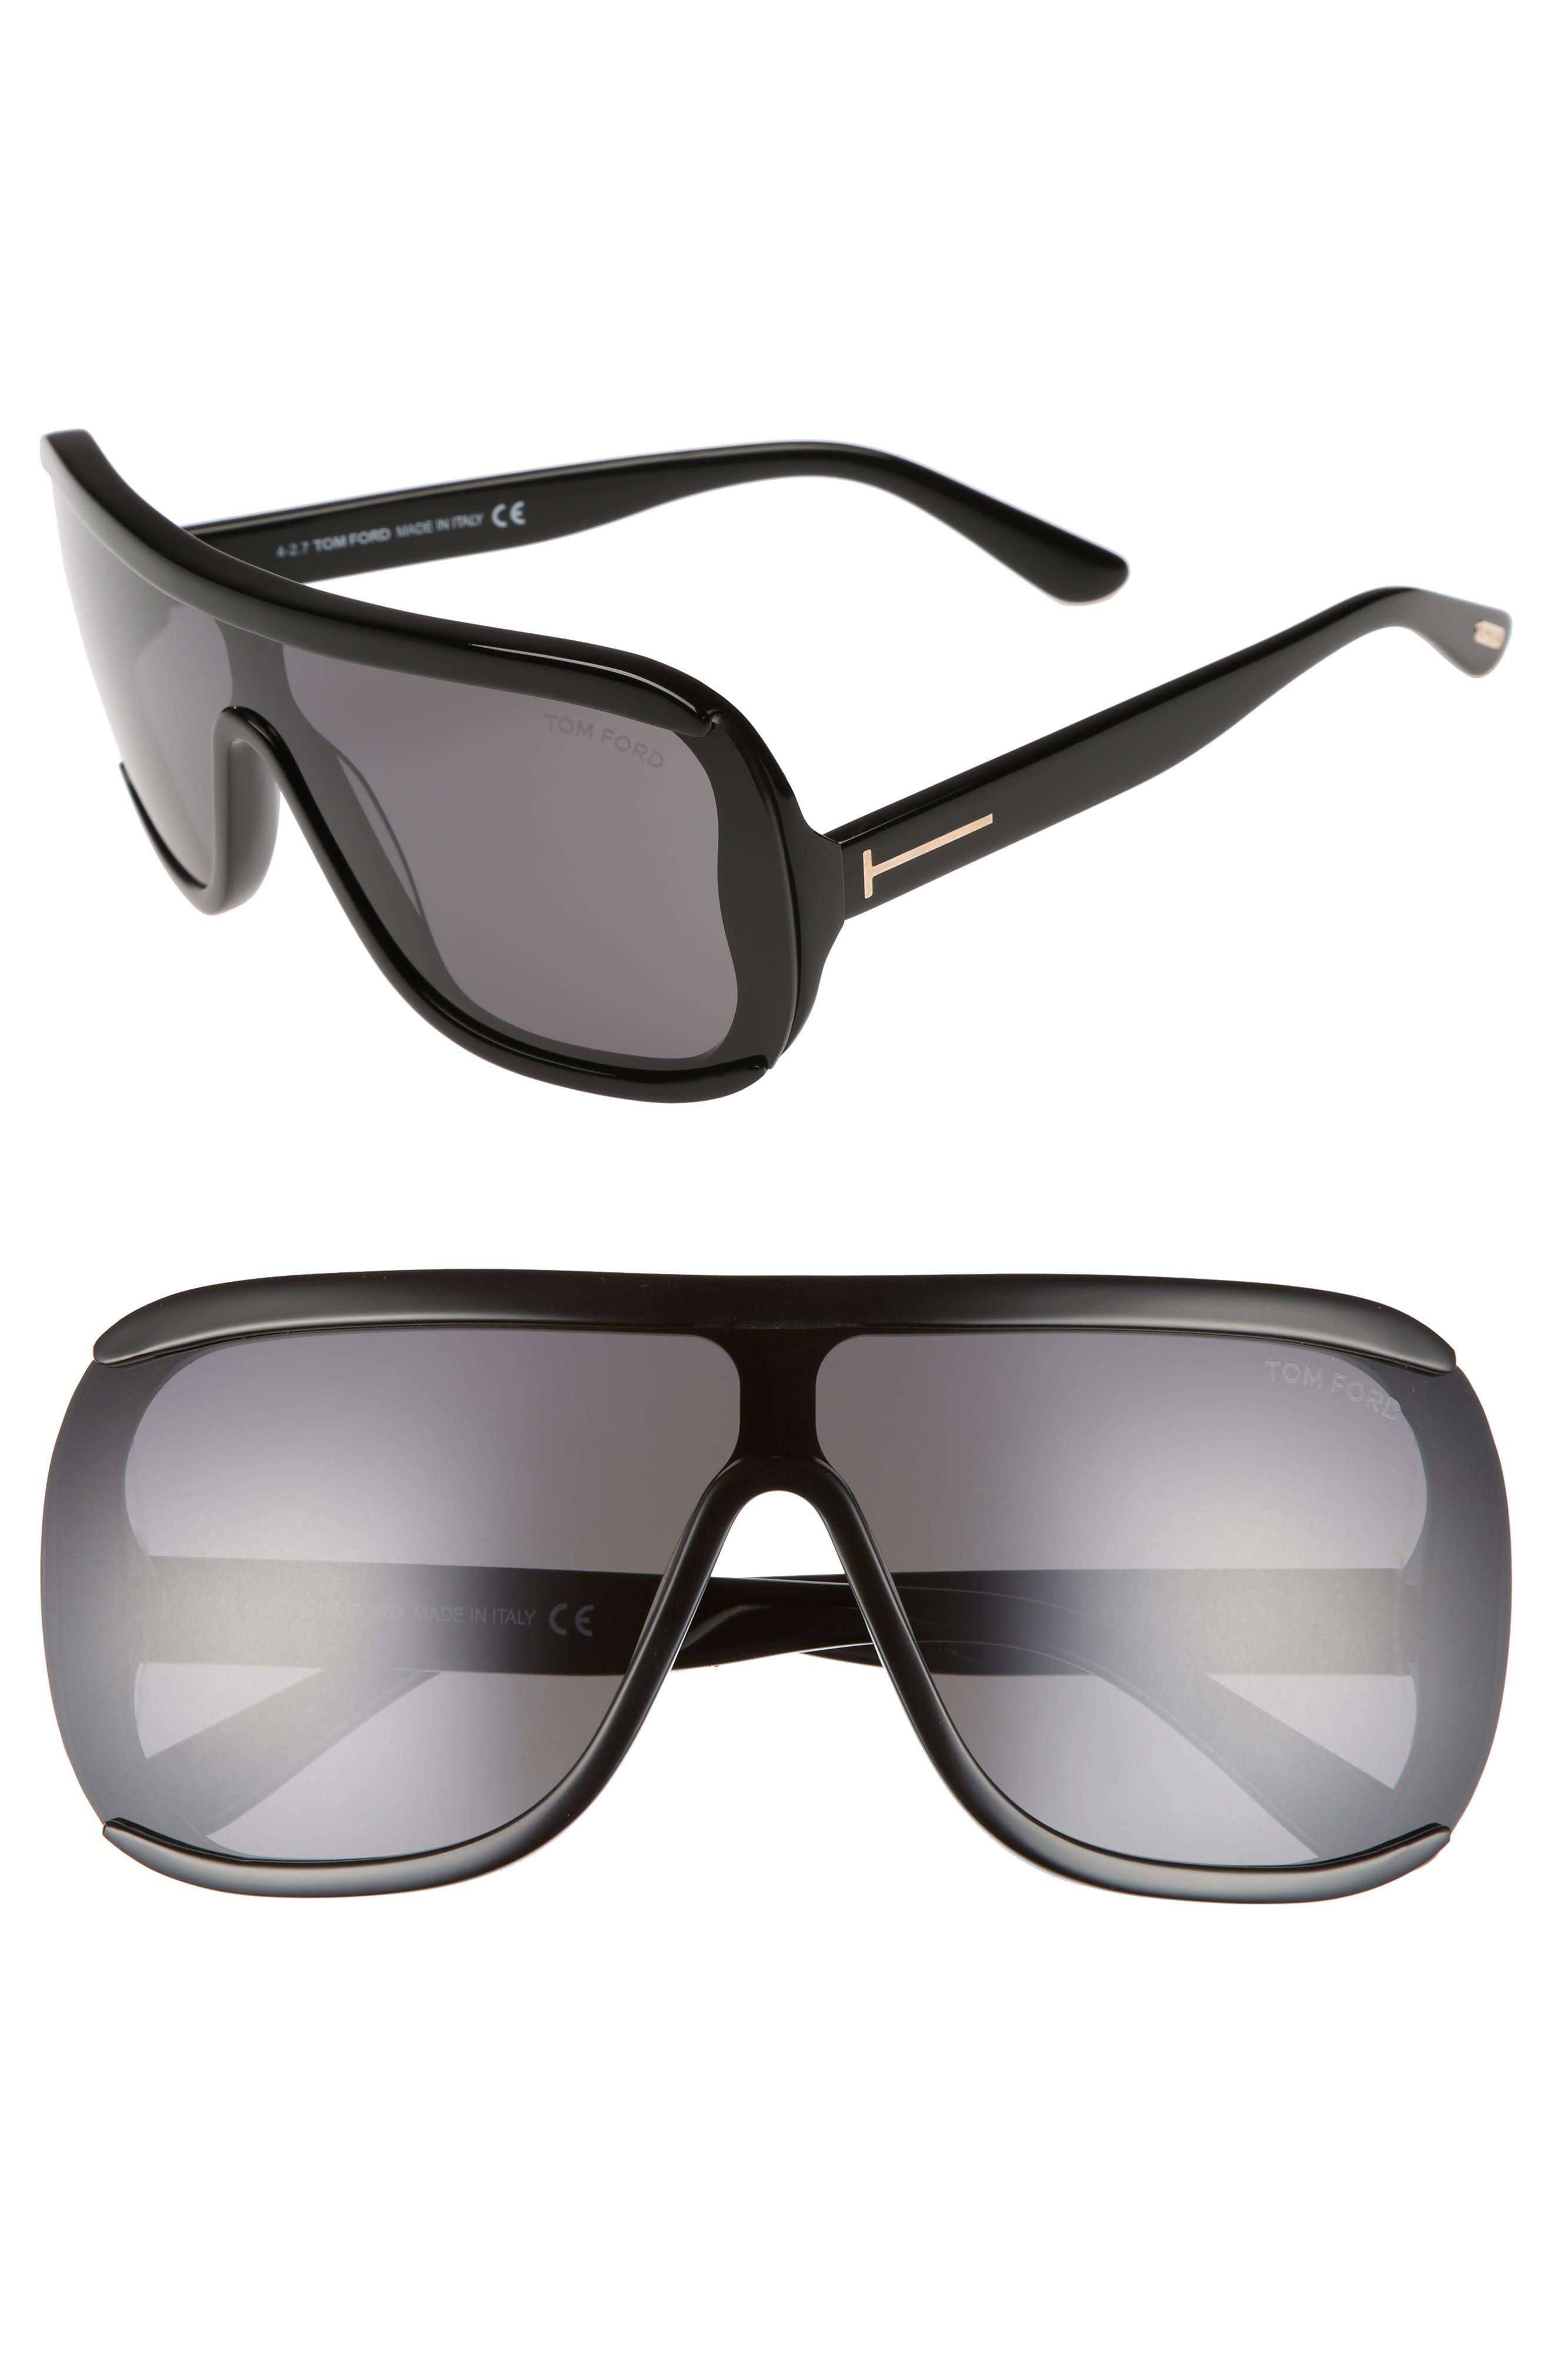 TOM FORD,                             Porfirio 65mm One-Piece Lens Shield Sunglasses,                             Main thumbnail 1, color,                             001